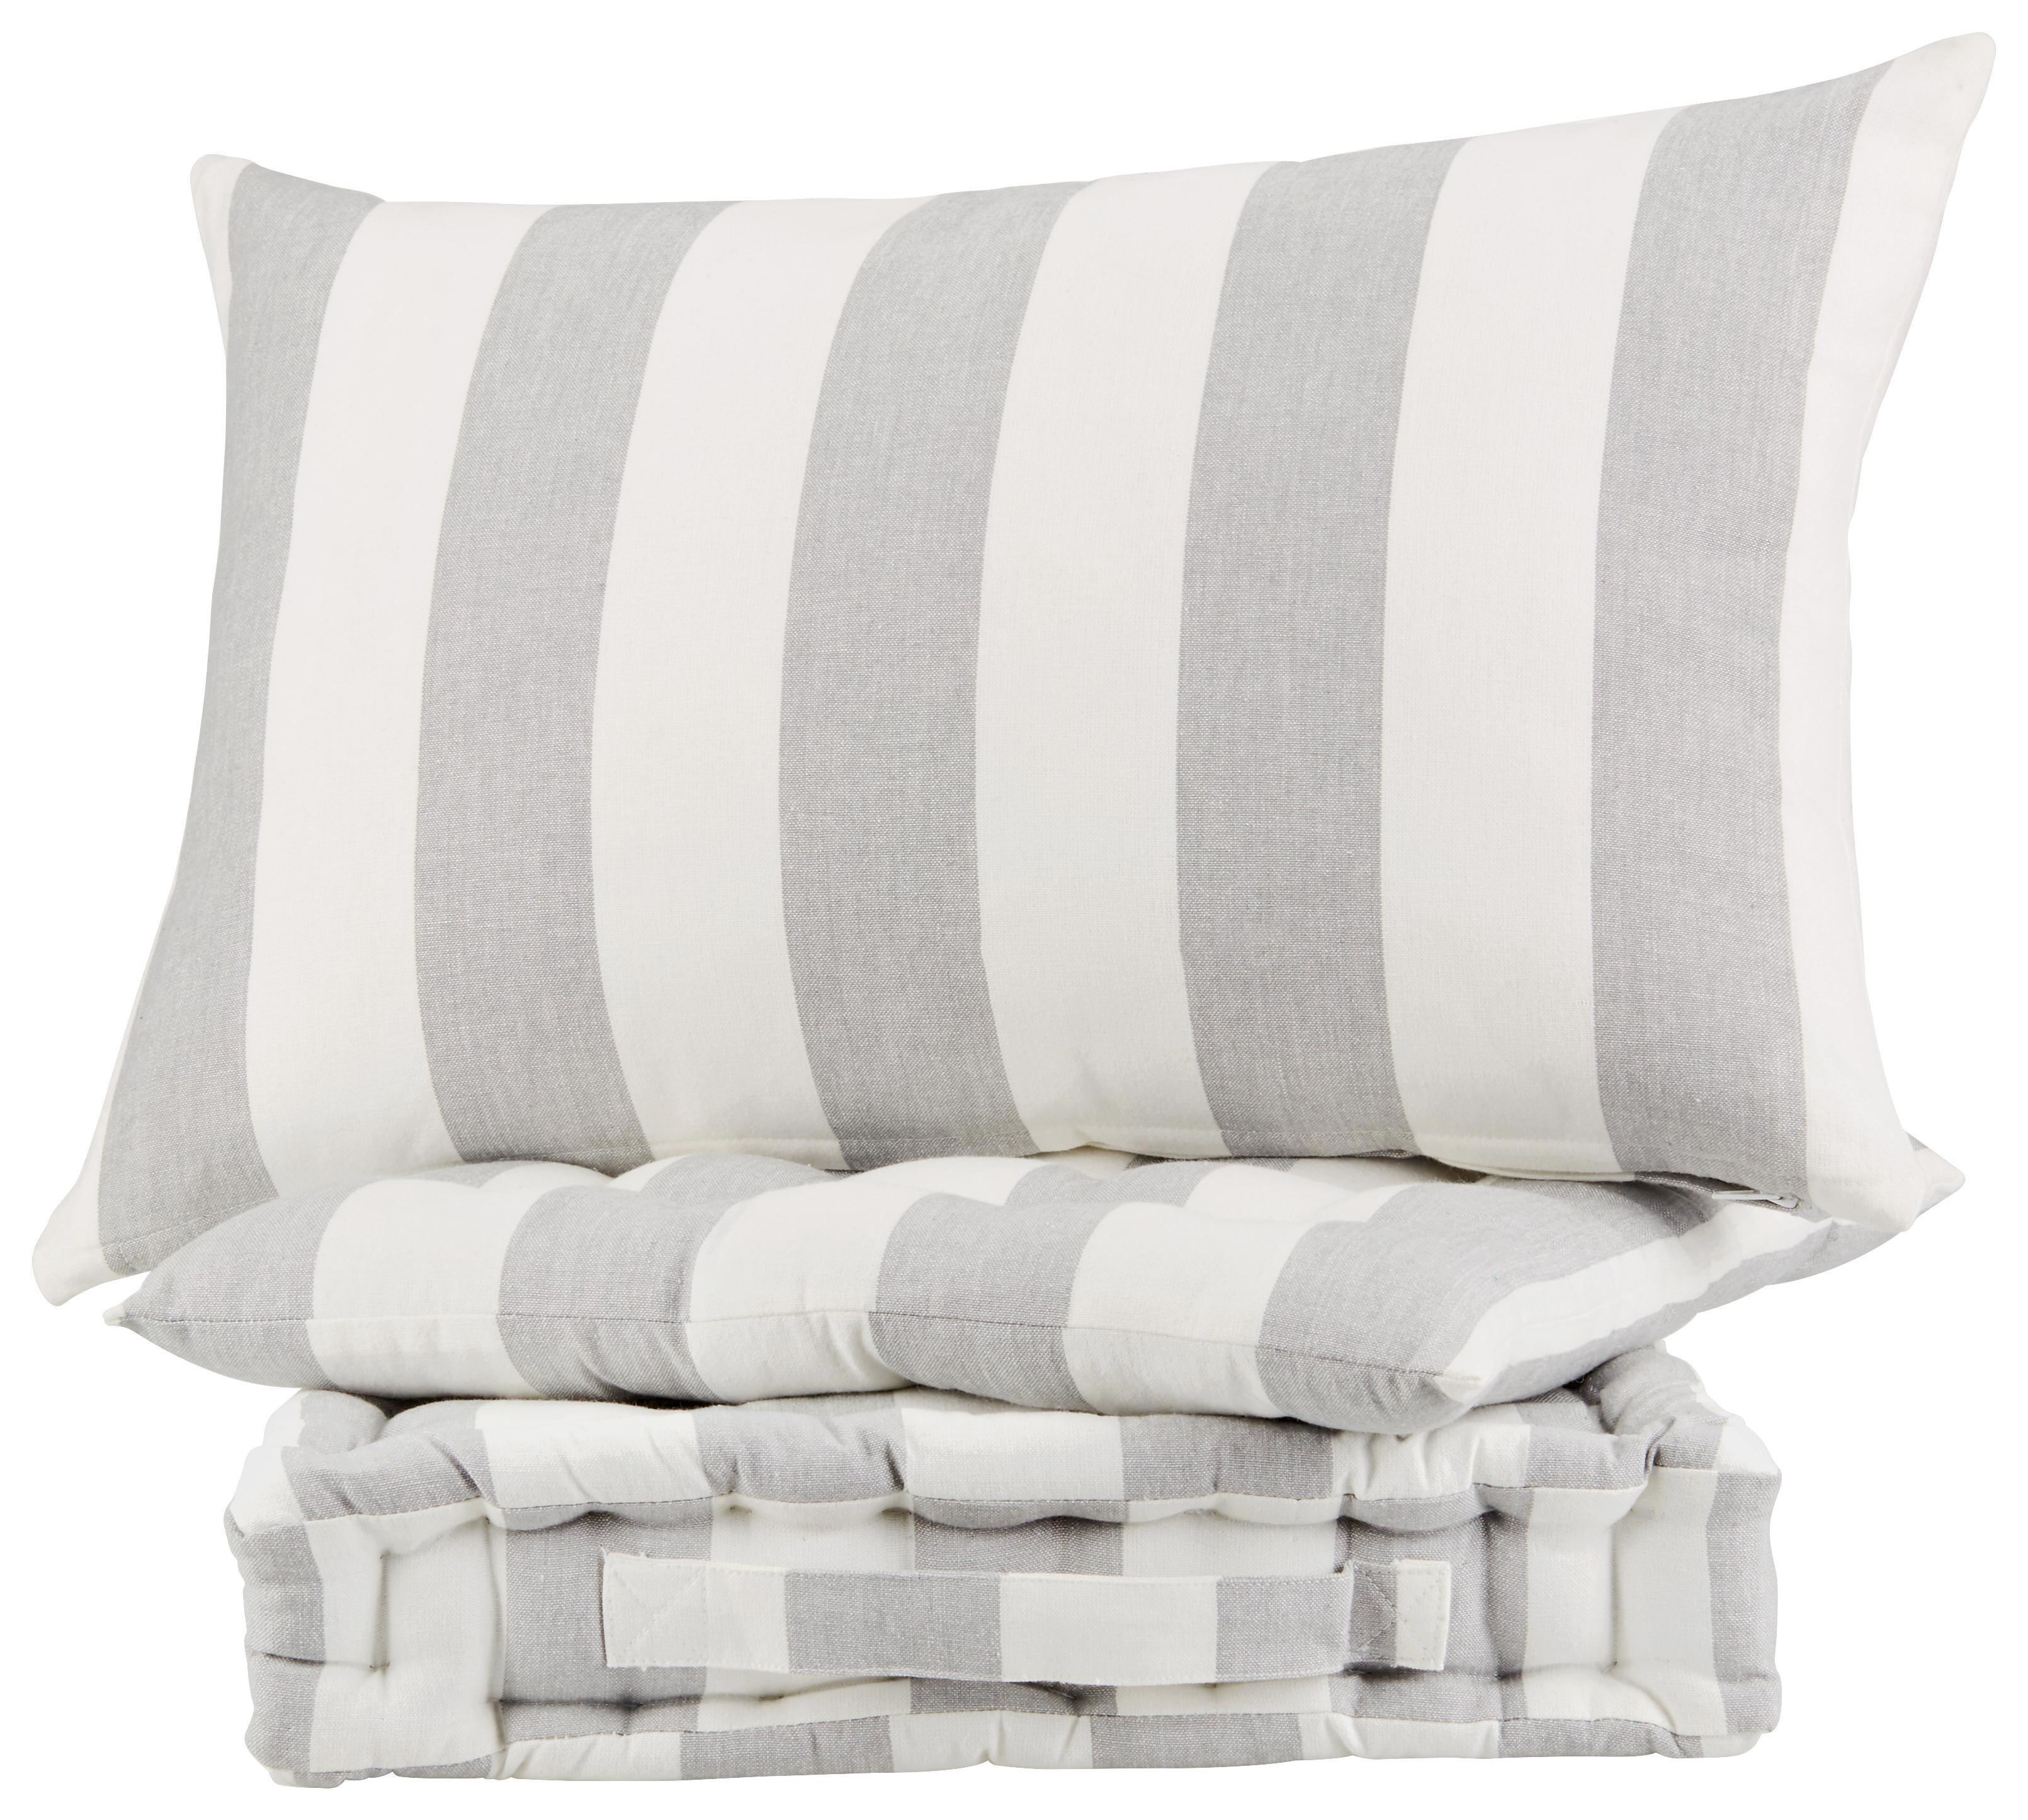 Zierkissen Blockstreif, ca. 40x60cm - Weiß/Grau, Textil (40/60cm) - MÖMAX modern living